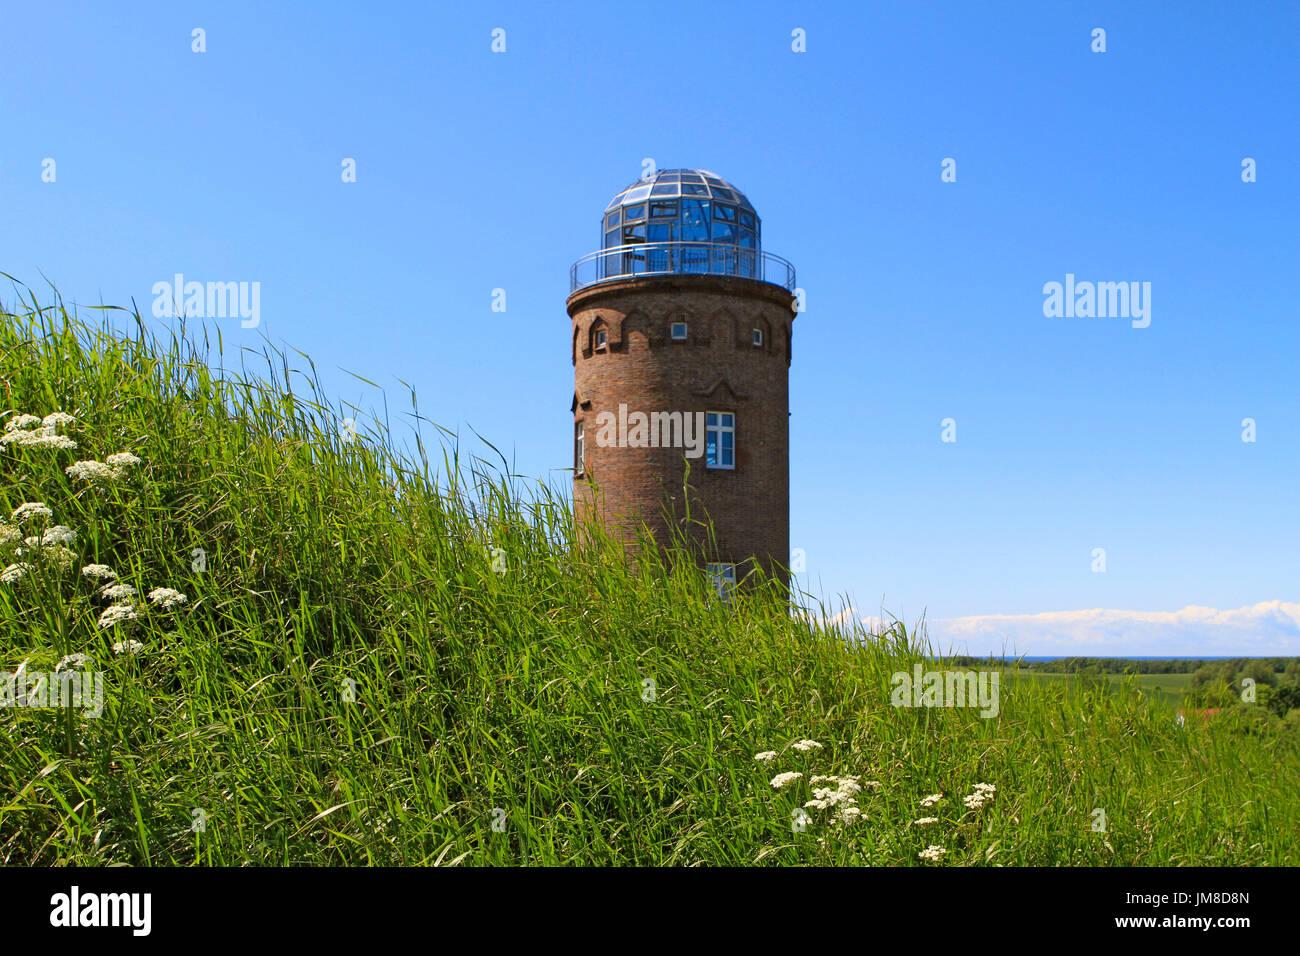 Peilturm Tower on the slavic fortress wall, exhibition building, Kap Arkona, Wittow Peninsula, Ruegen, Germany, Europe - Stock Image